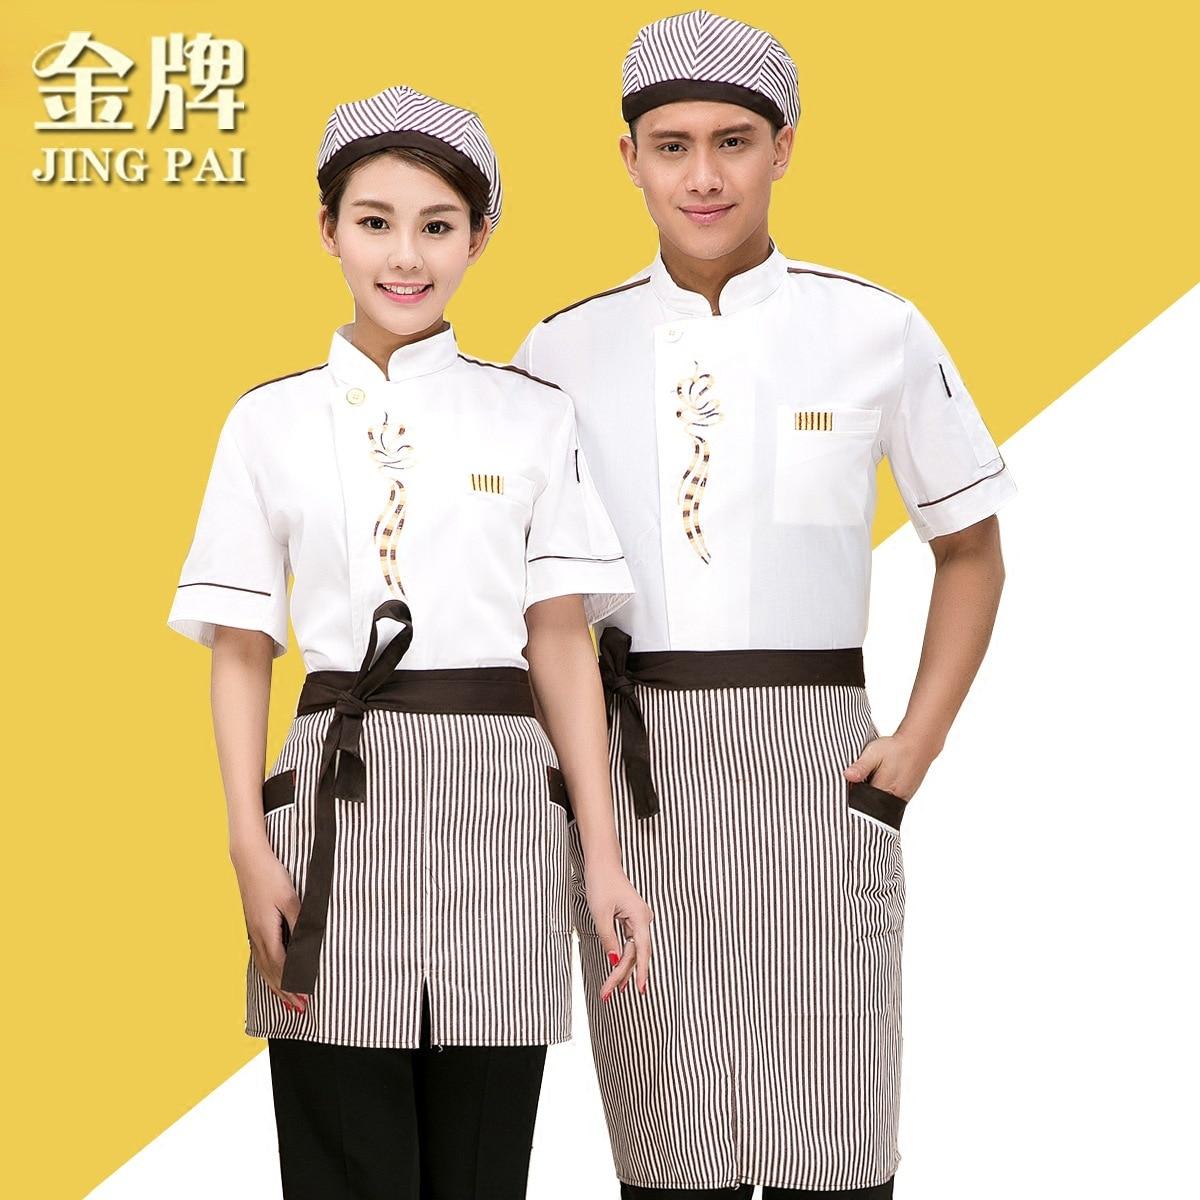 Cook Suit Summer Short-sleeve Chef Uniform Clothes Kitchen Clothes Cook Work Wear Hotel Restaurant Working Clothes B-5974